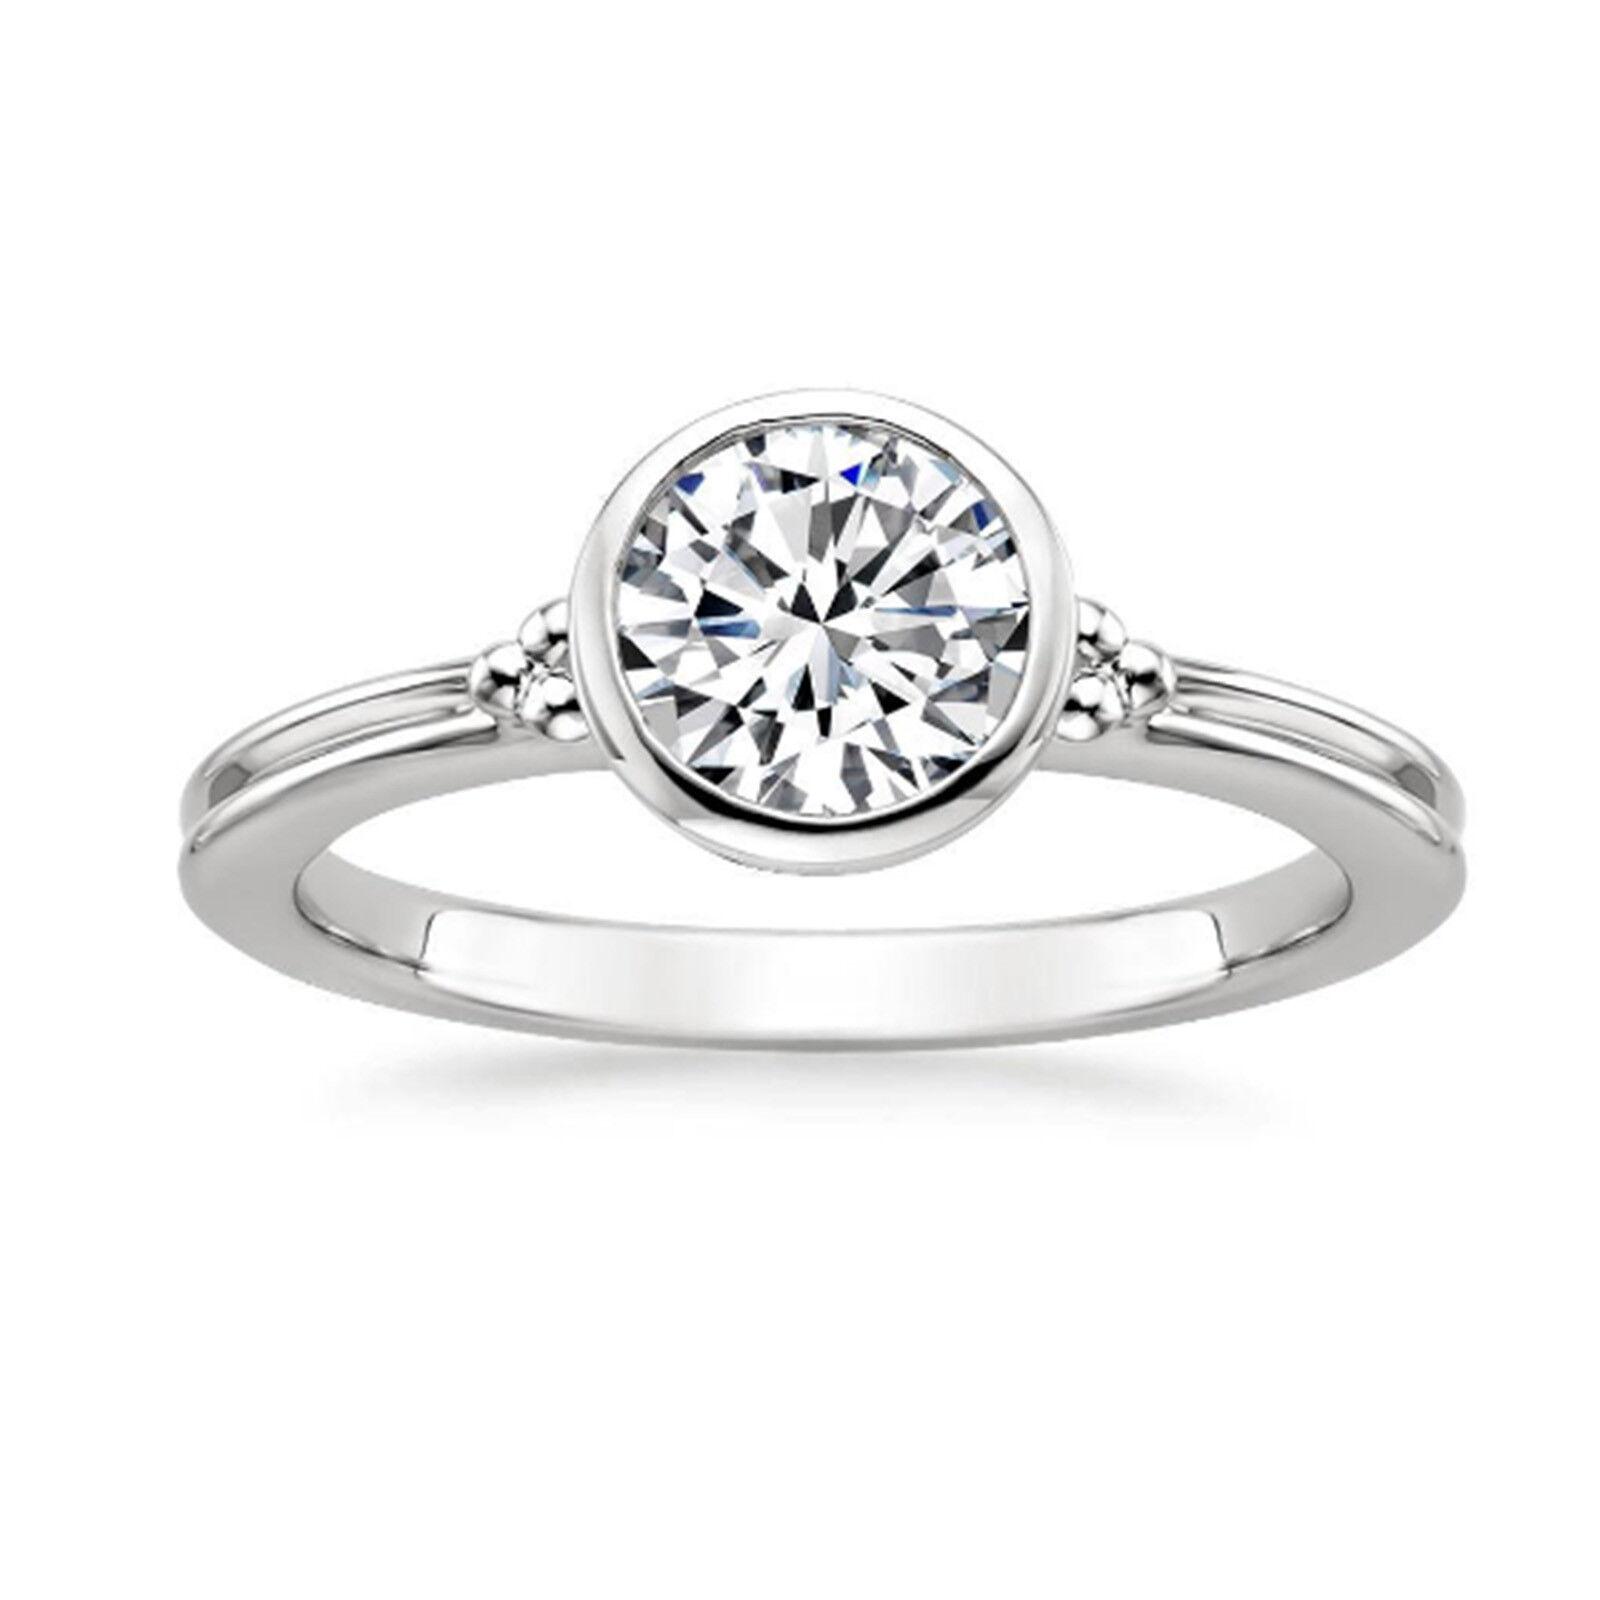 1.00 Ct Round Cut Moissanite Engagement Wedding Ring 14K White gold Size 6 7